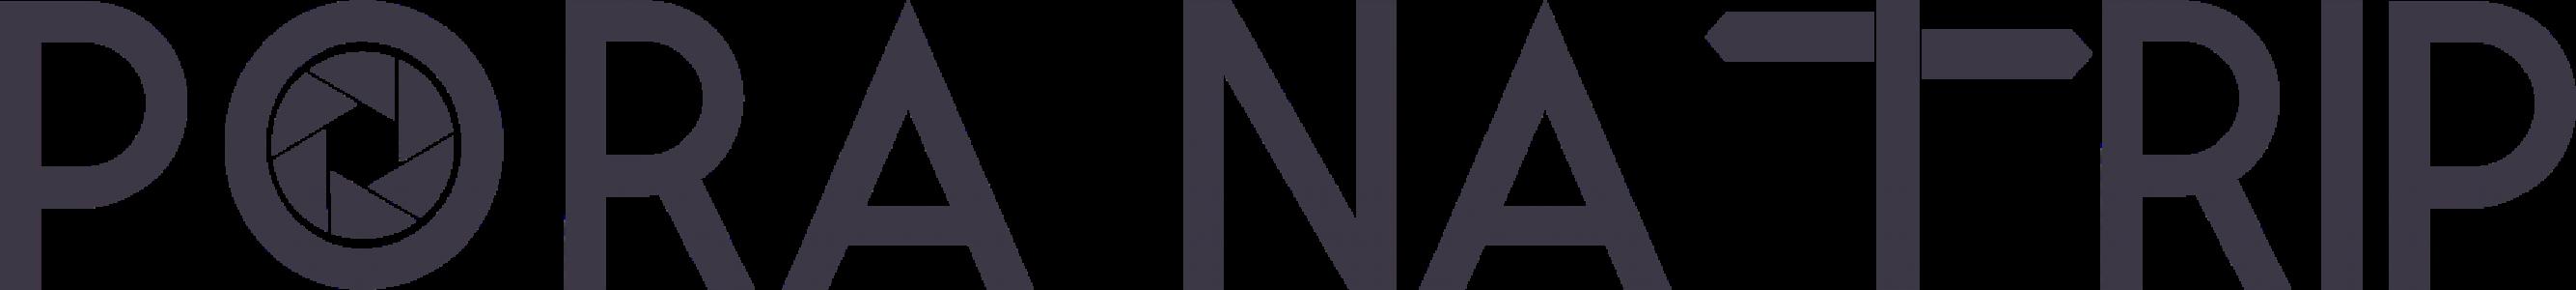 cropped-pnt_logo_gray-1.png